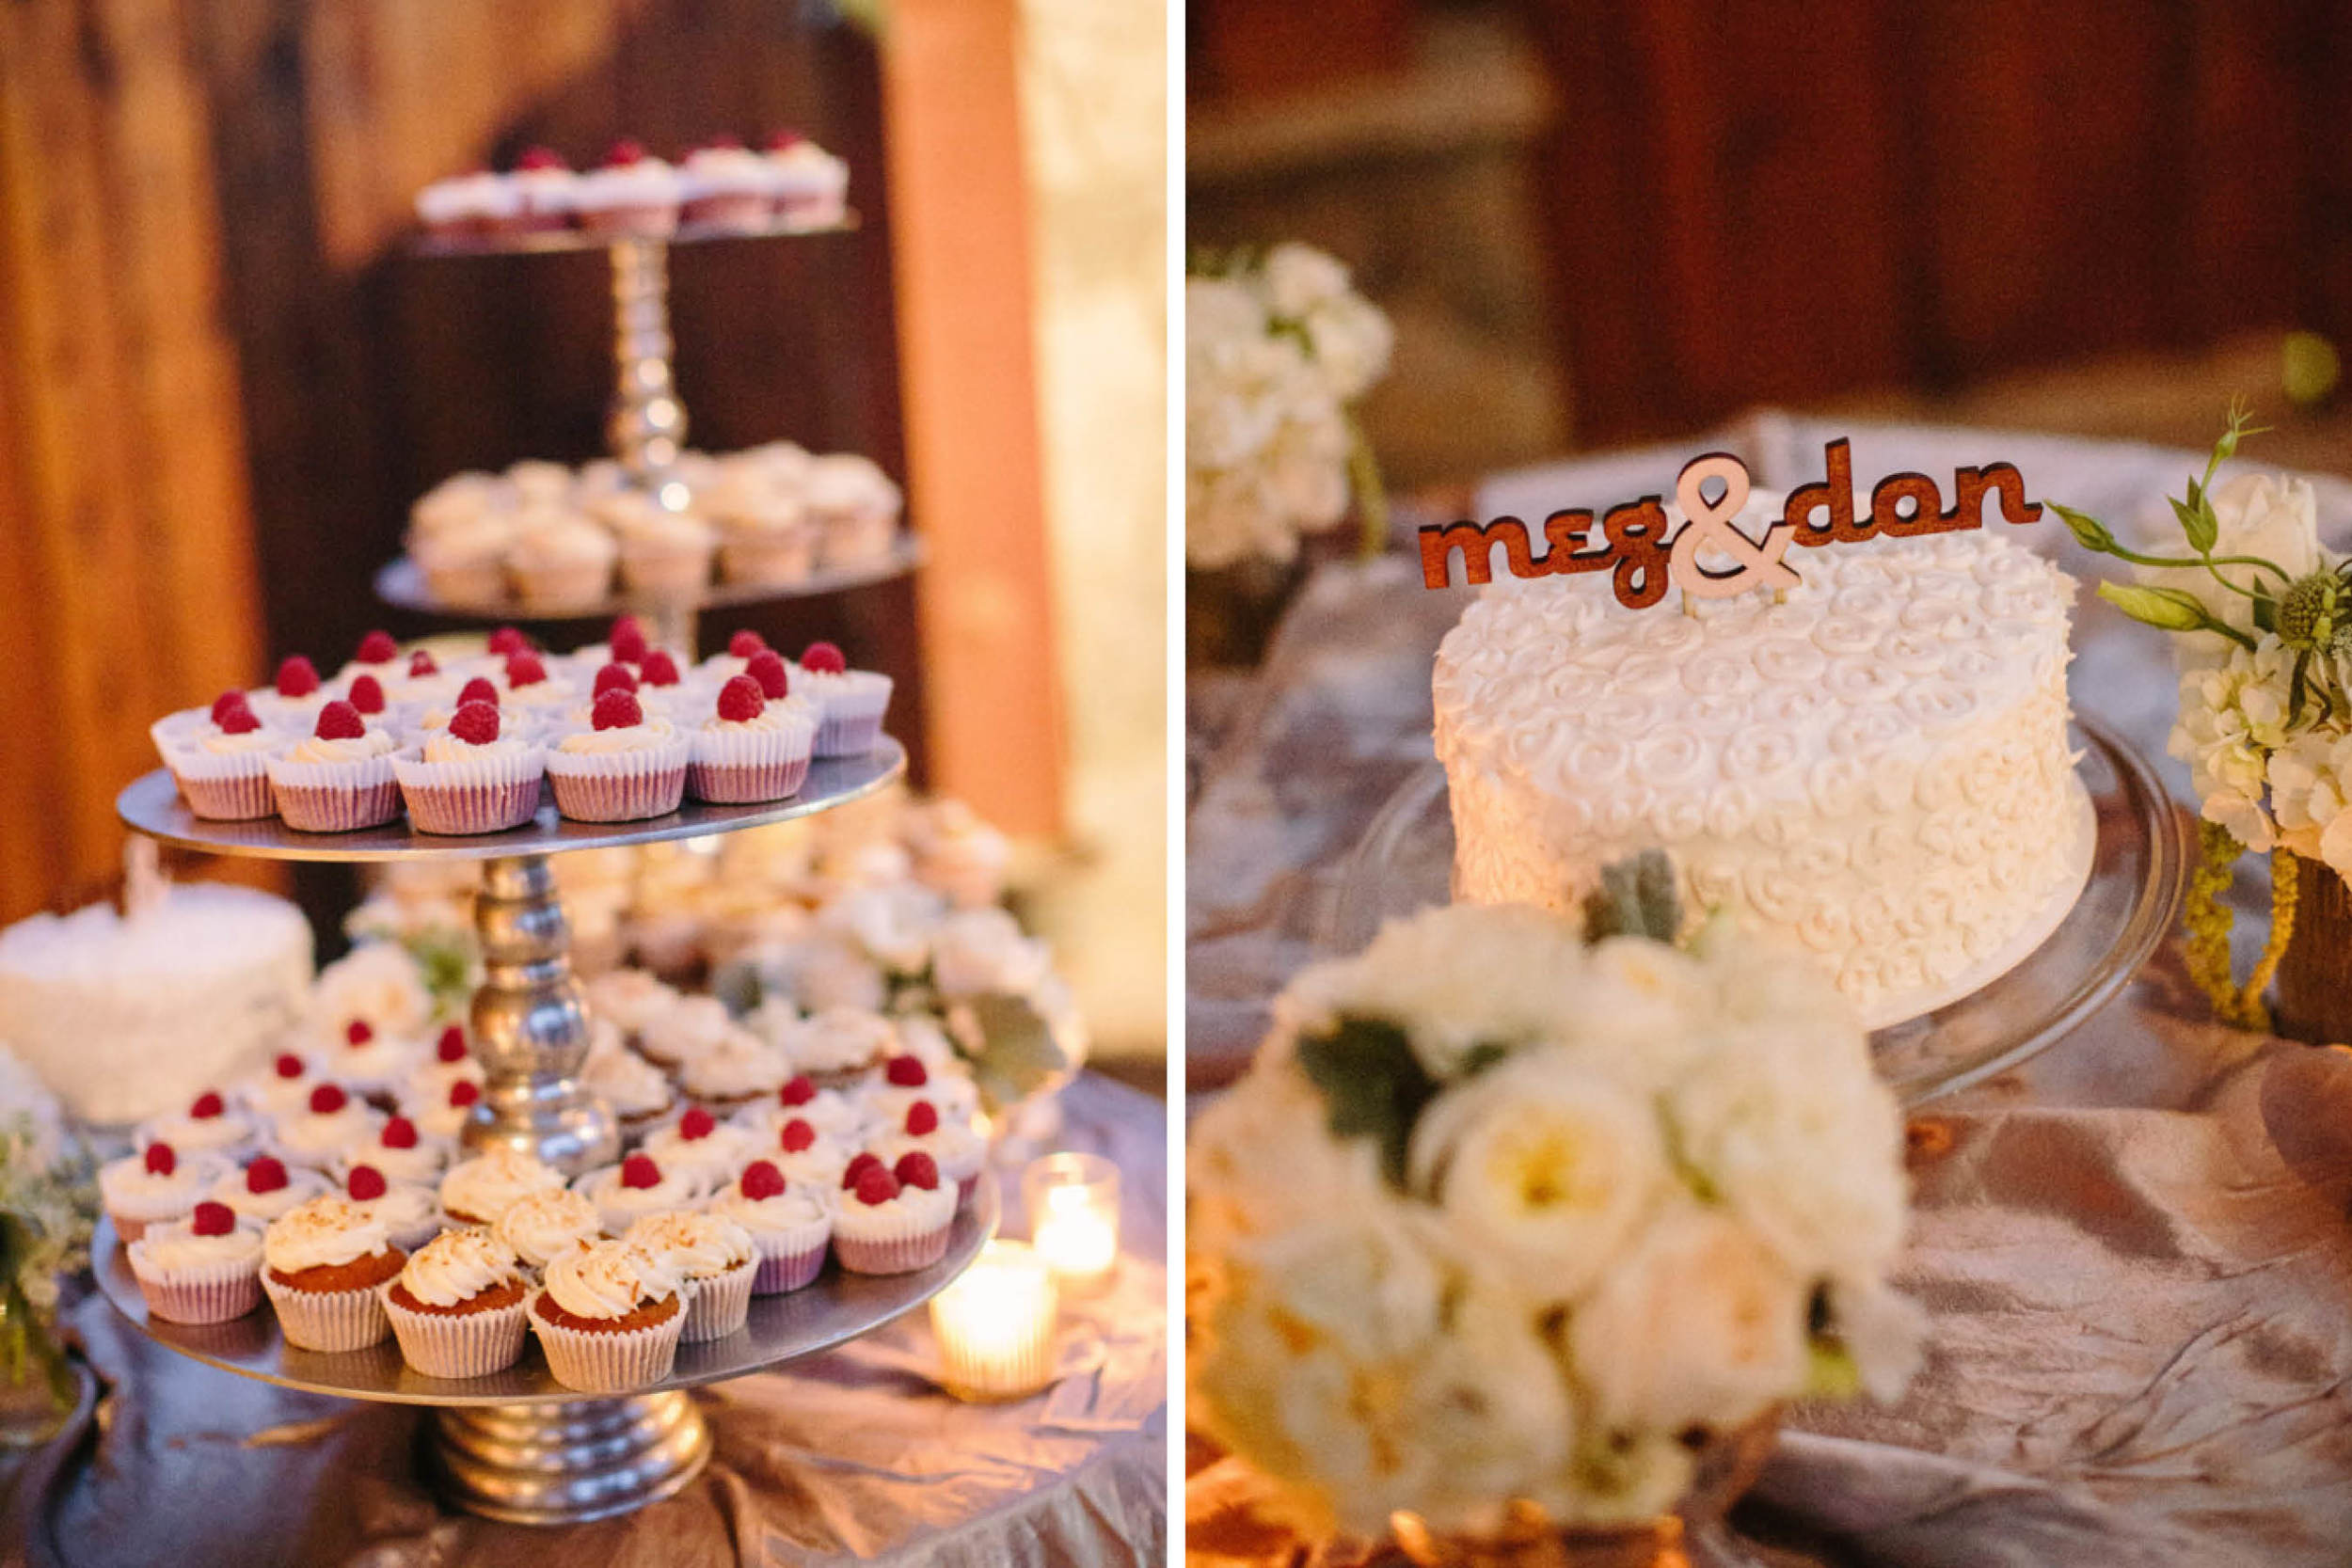 alegria-by-design-tres-hermanas-winery-vineyard-wedding-planner-coordinator-santa-barbara-ynez-maria (19).jpg